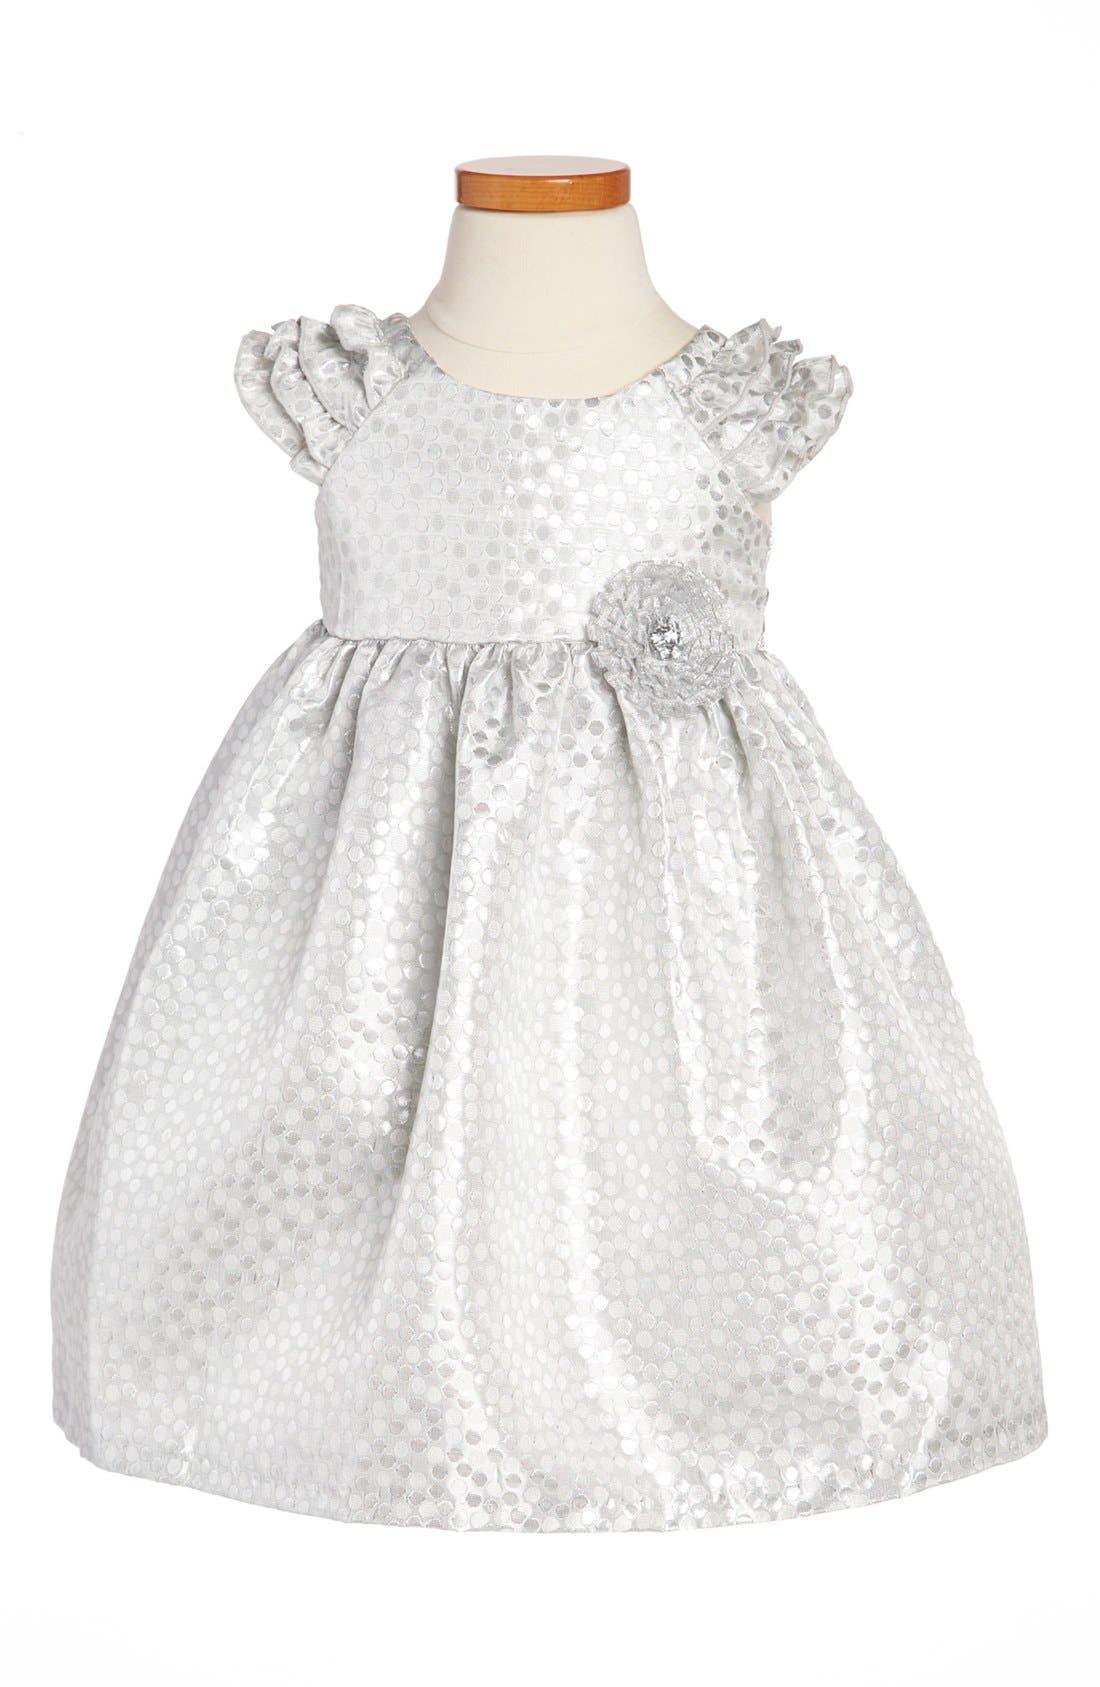 Alternate Image 1 Selected - Laura Ashley Brocade Dress (Toddler Girls)